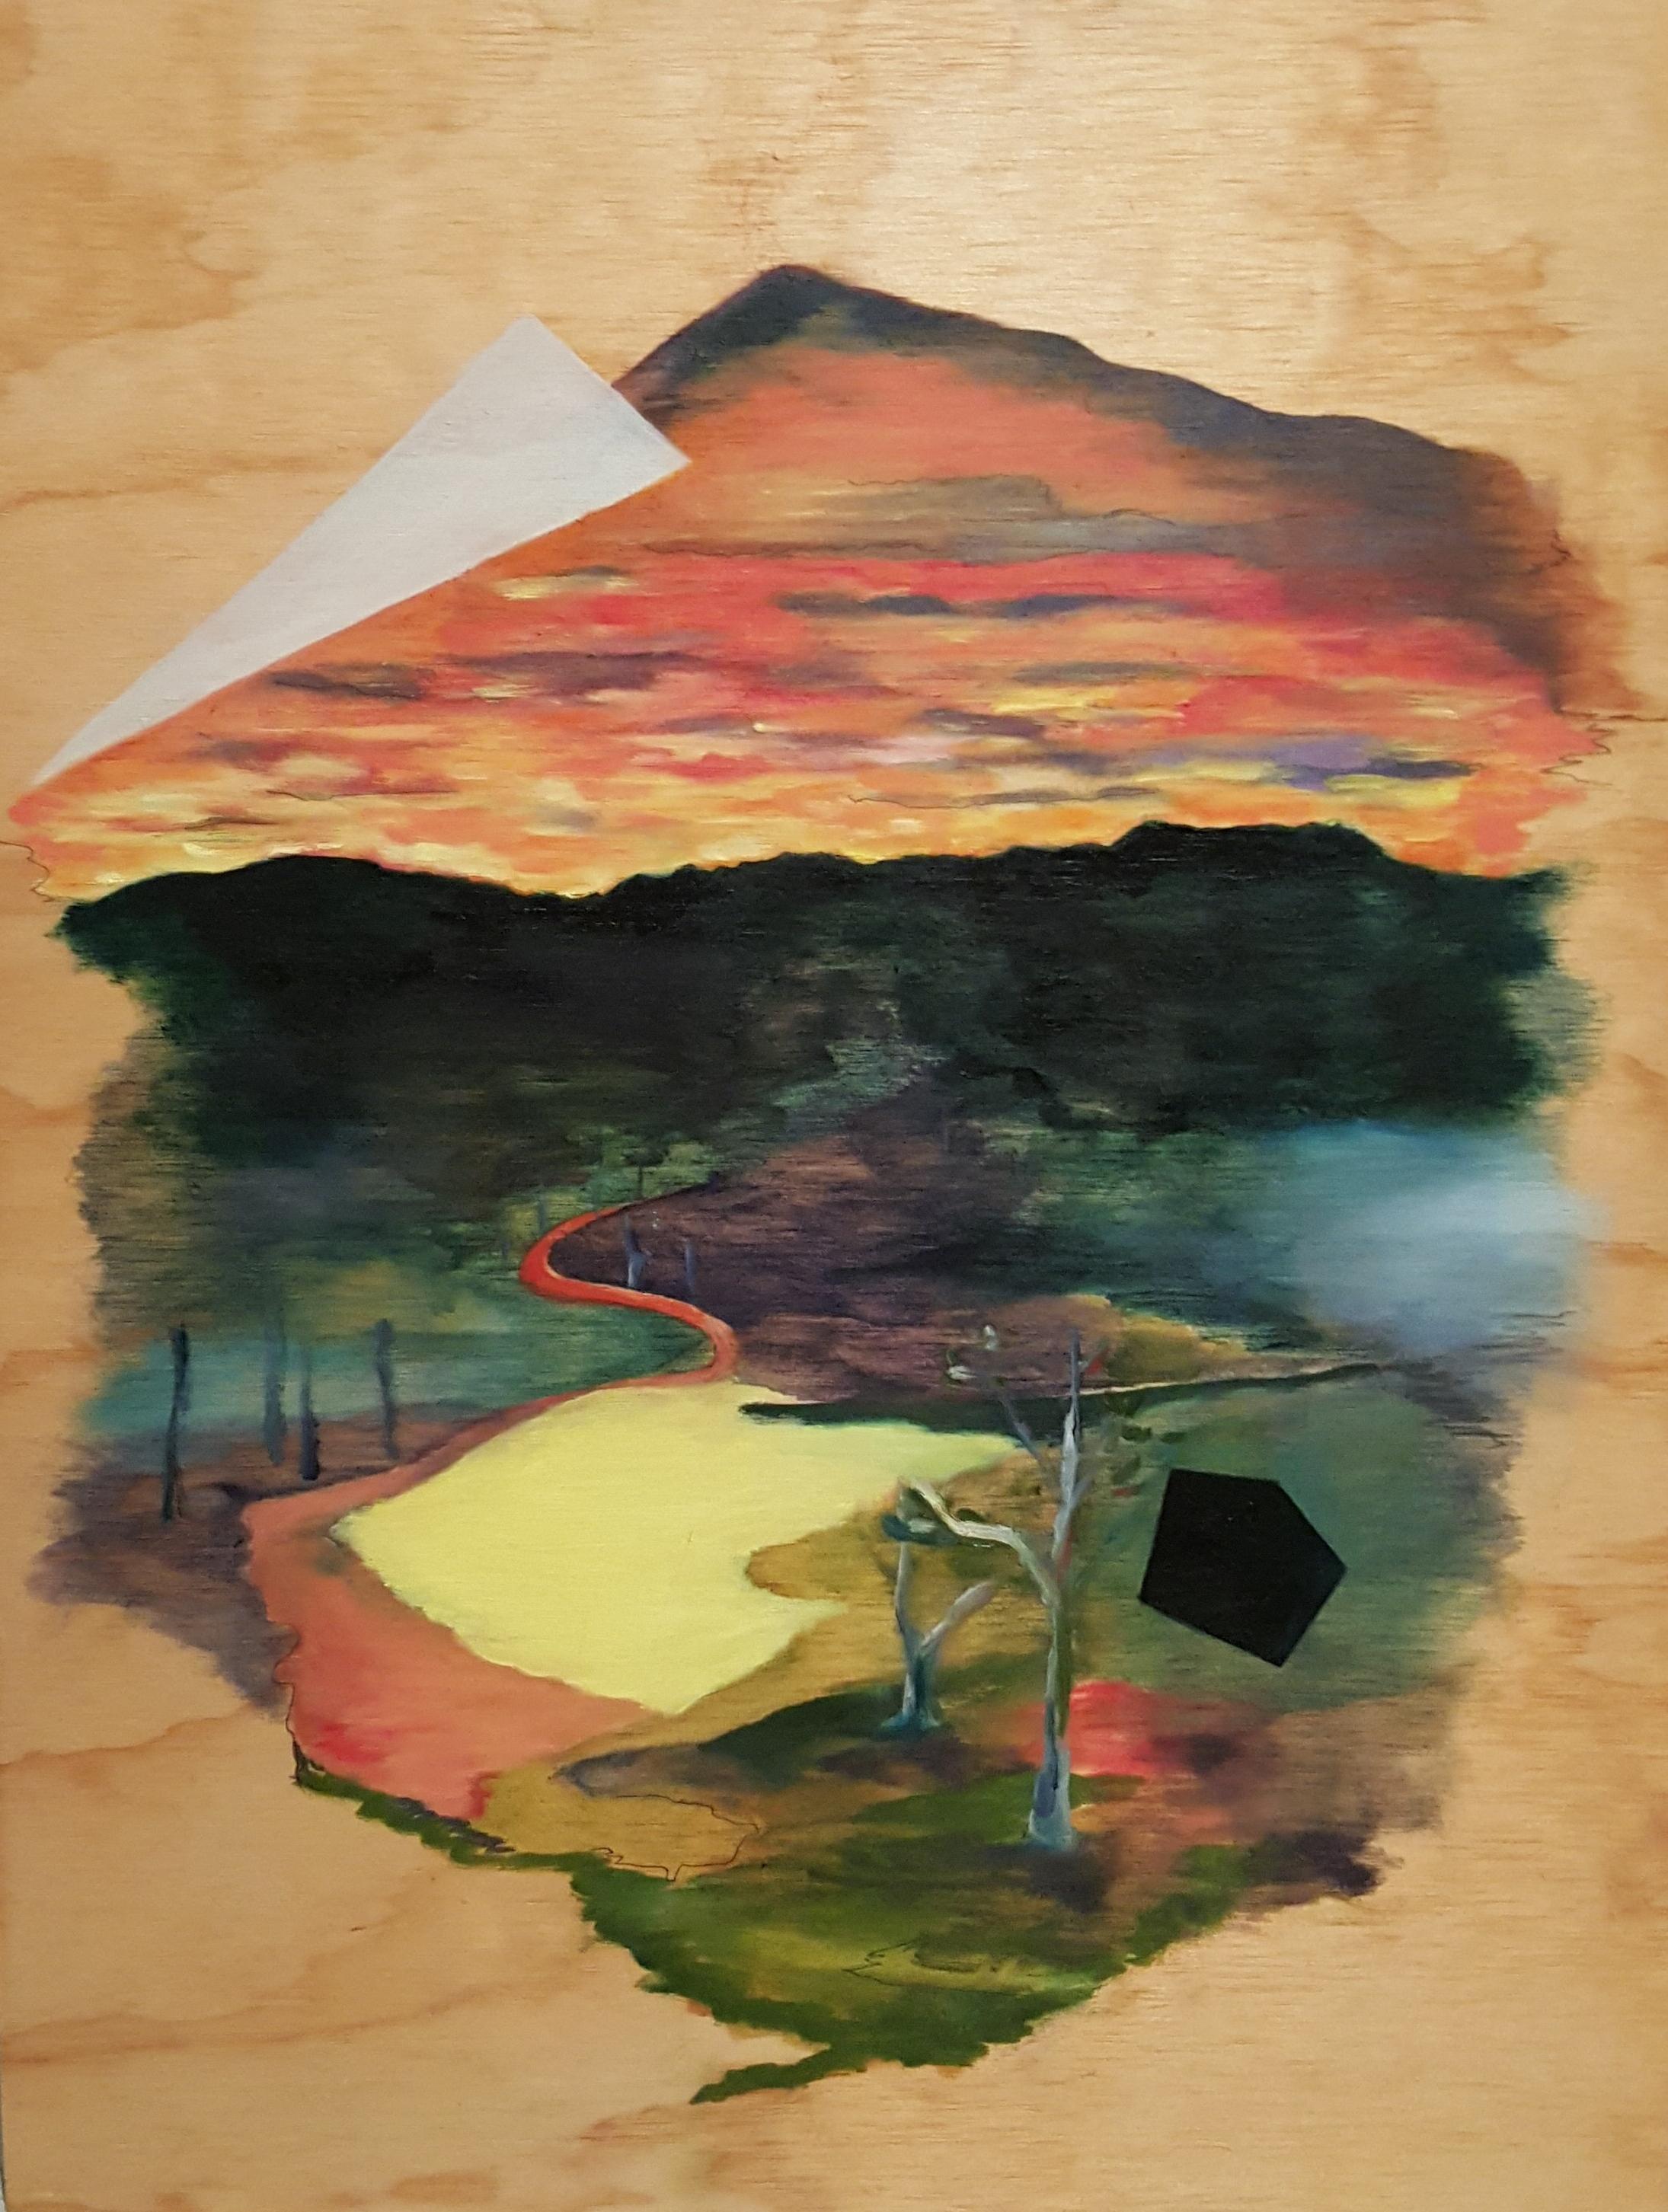 Hearn, N (2015). The Brightest Light